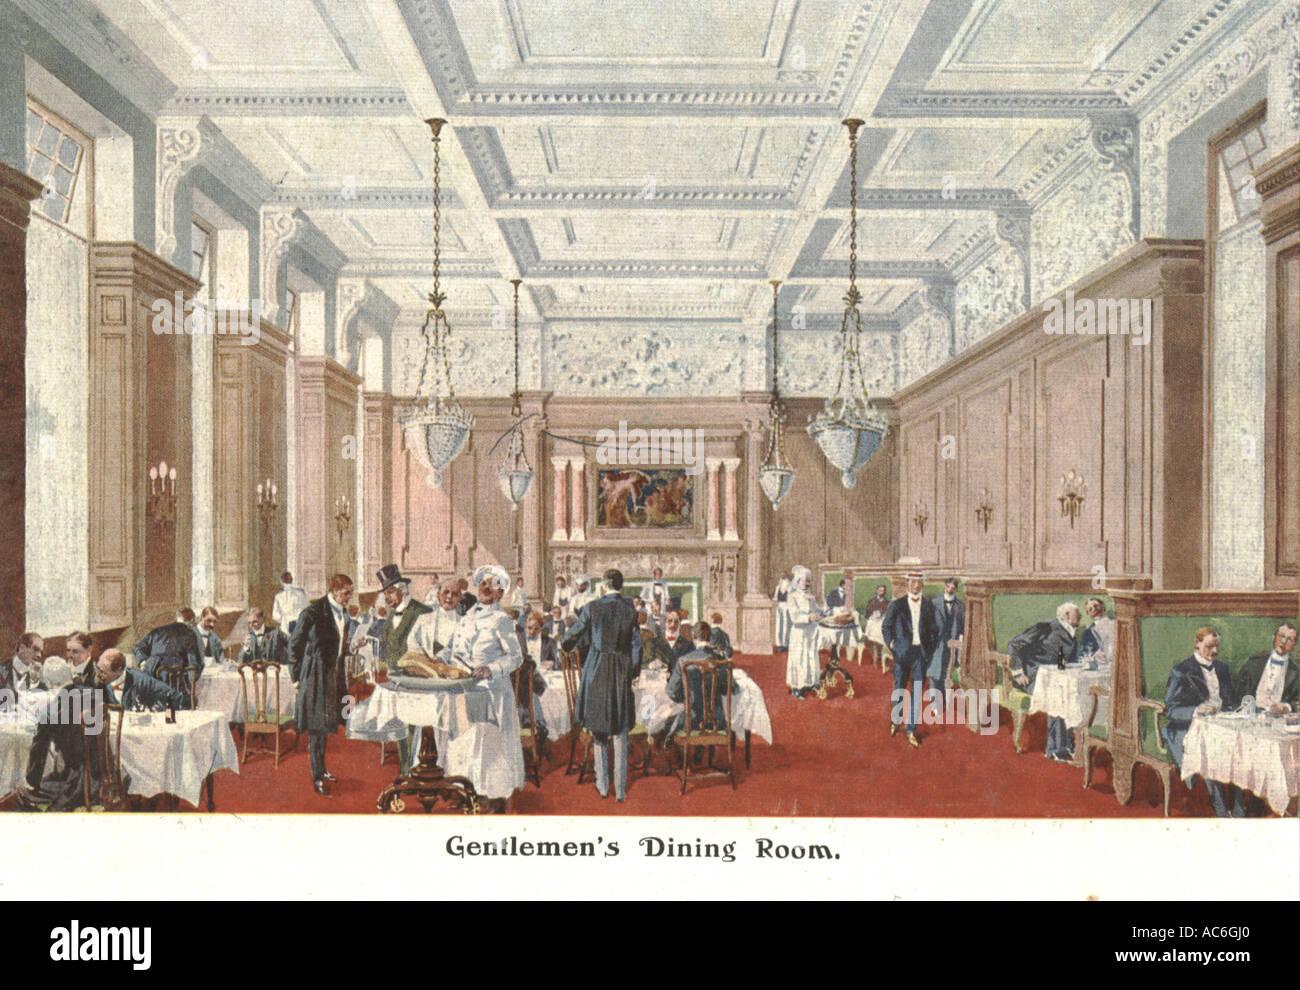 gentlemen's dining room, 1906, simpson's in the strand, london